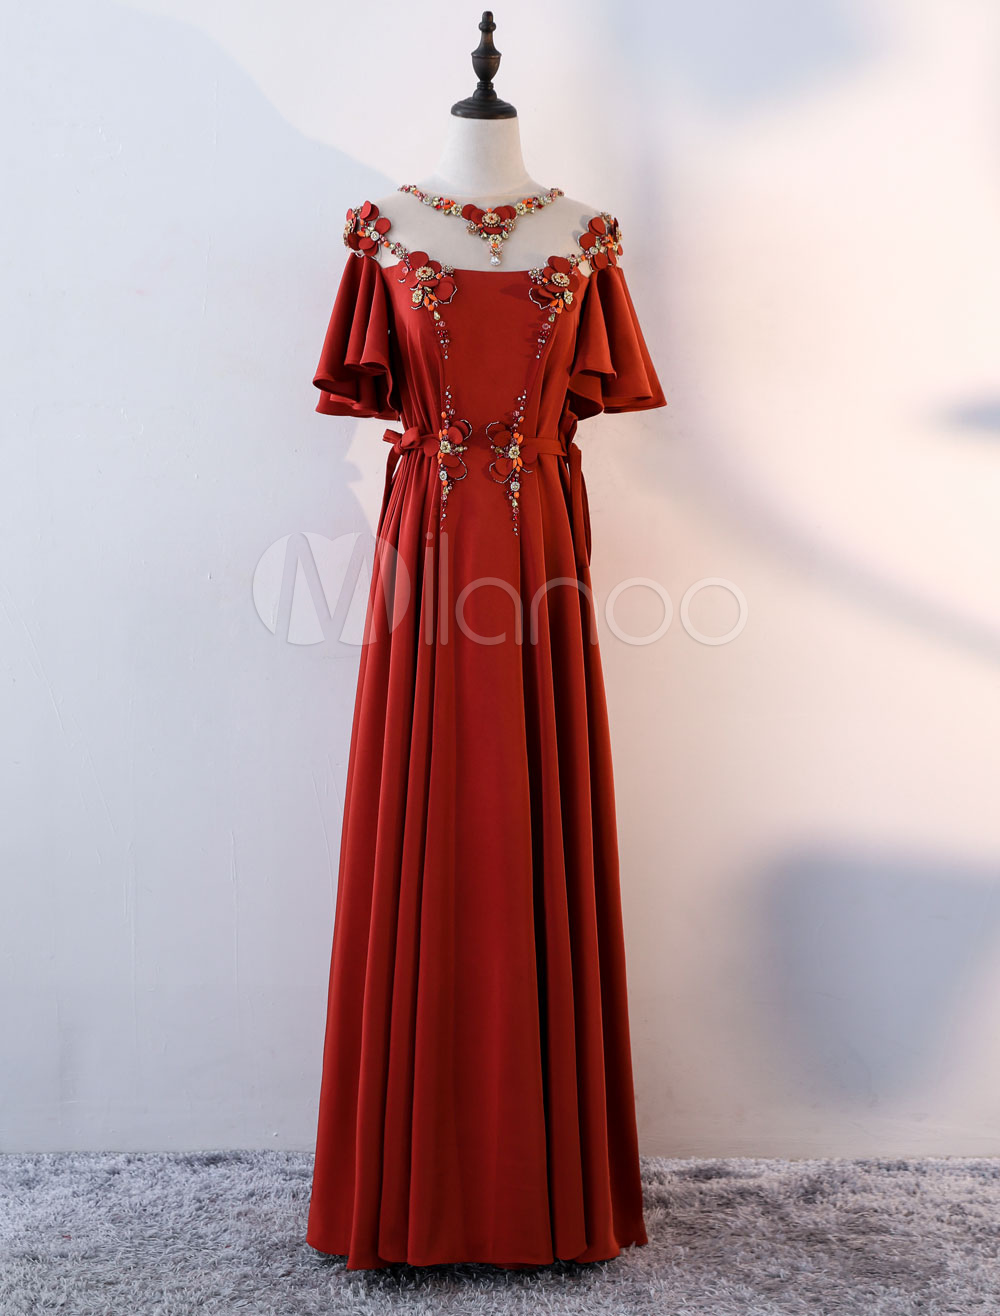 Evening Dresses Satin Burgundy Flowers Beaded Butterfly Sleeve Ruffles Illusion Ribbon Sash Formal Dress